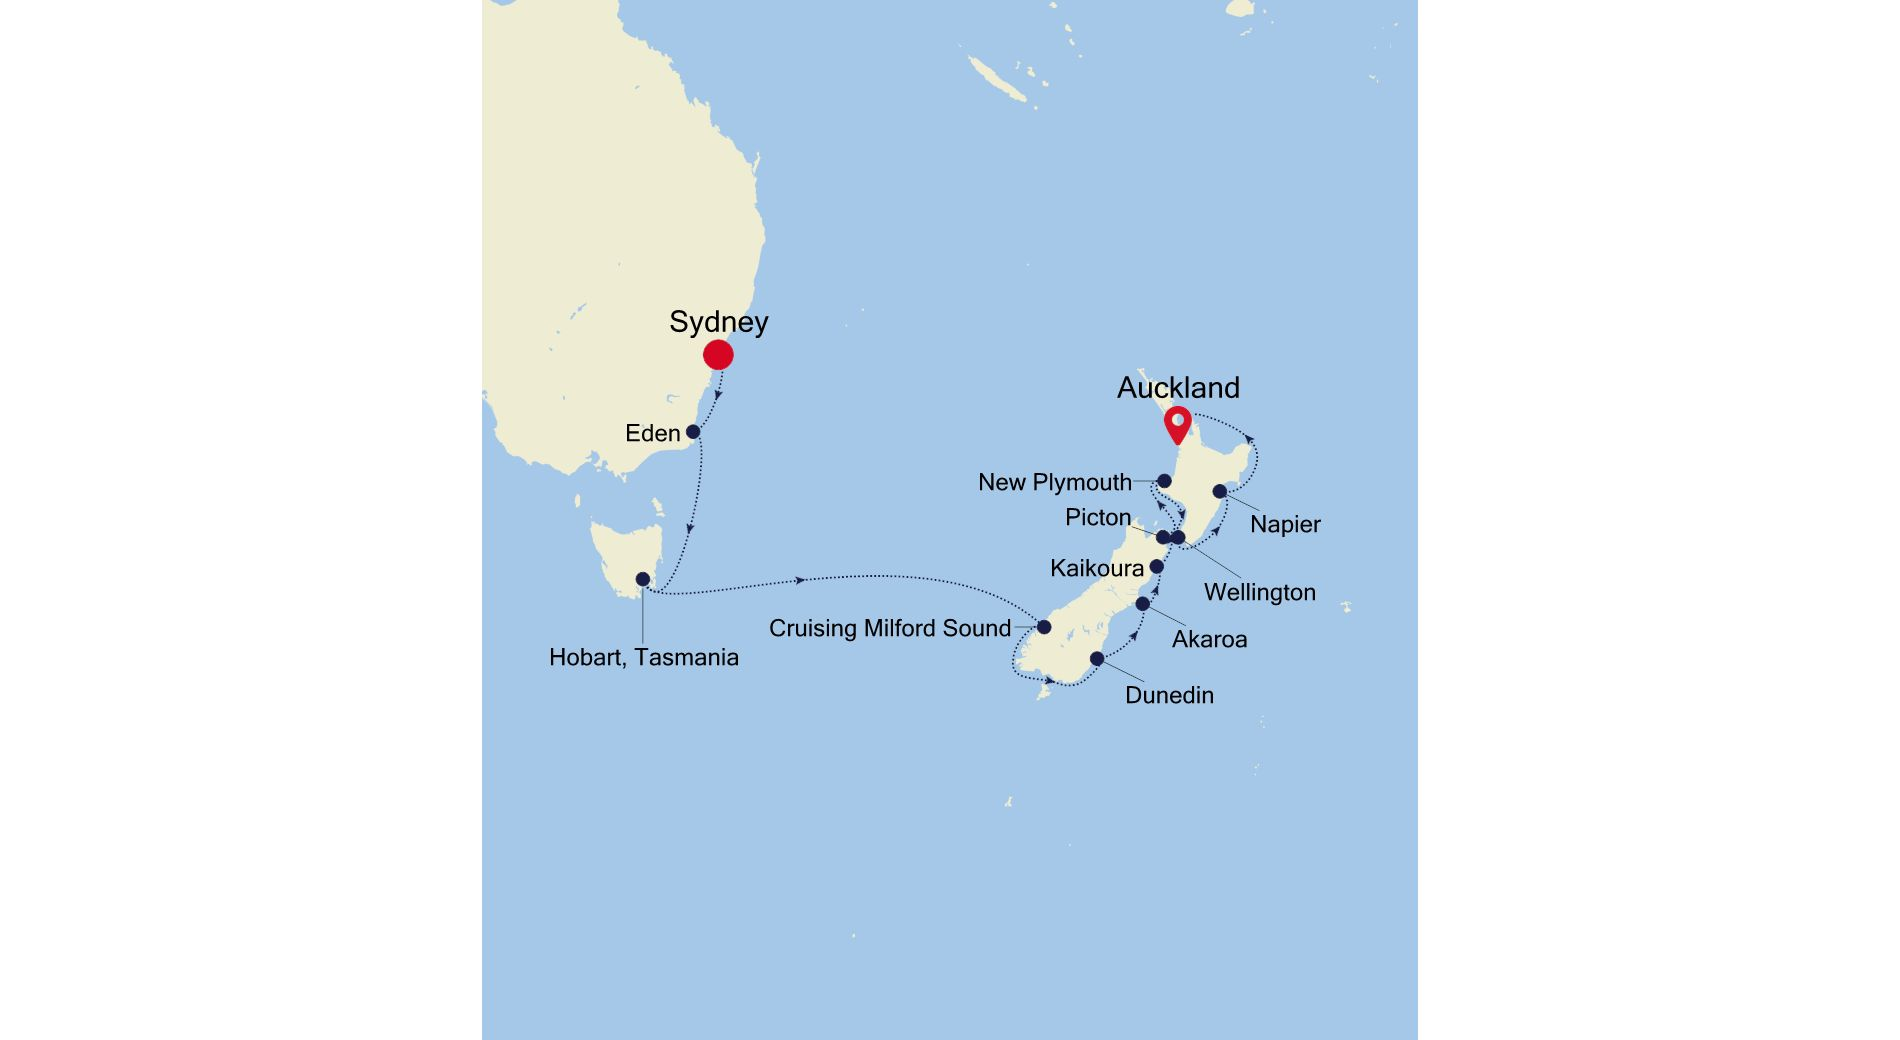 SS220203015 - Sydney à Auckland